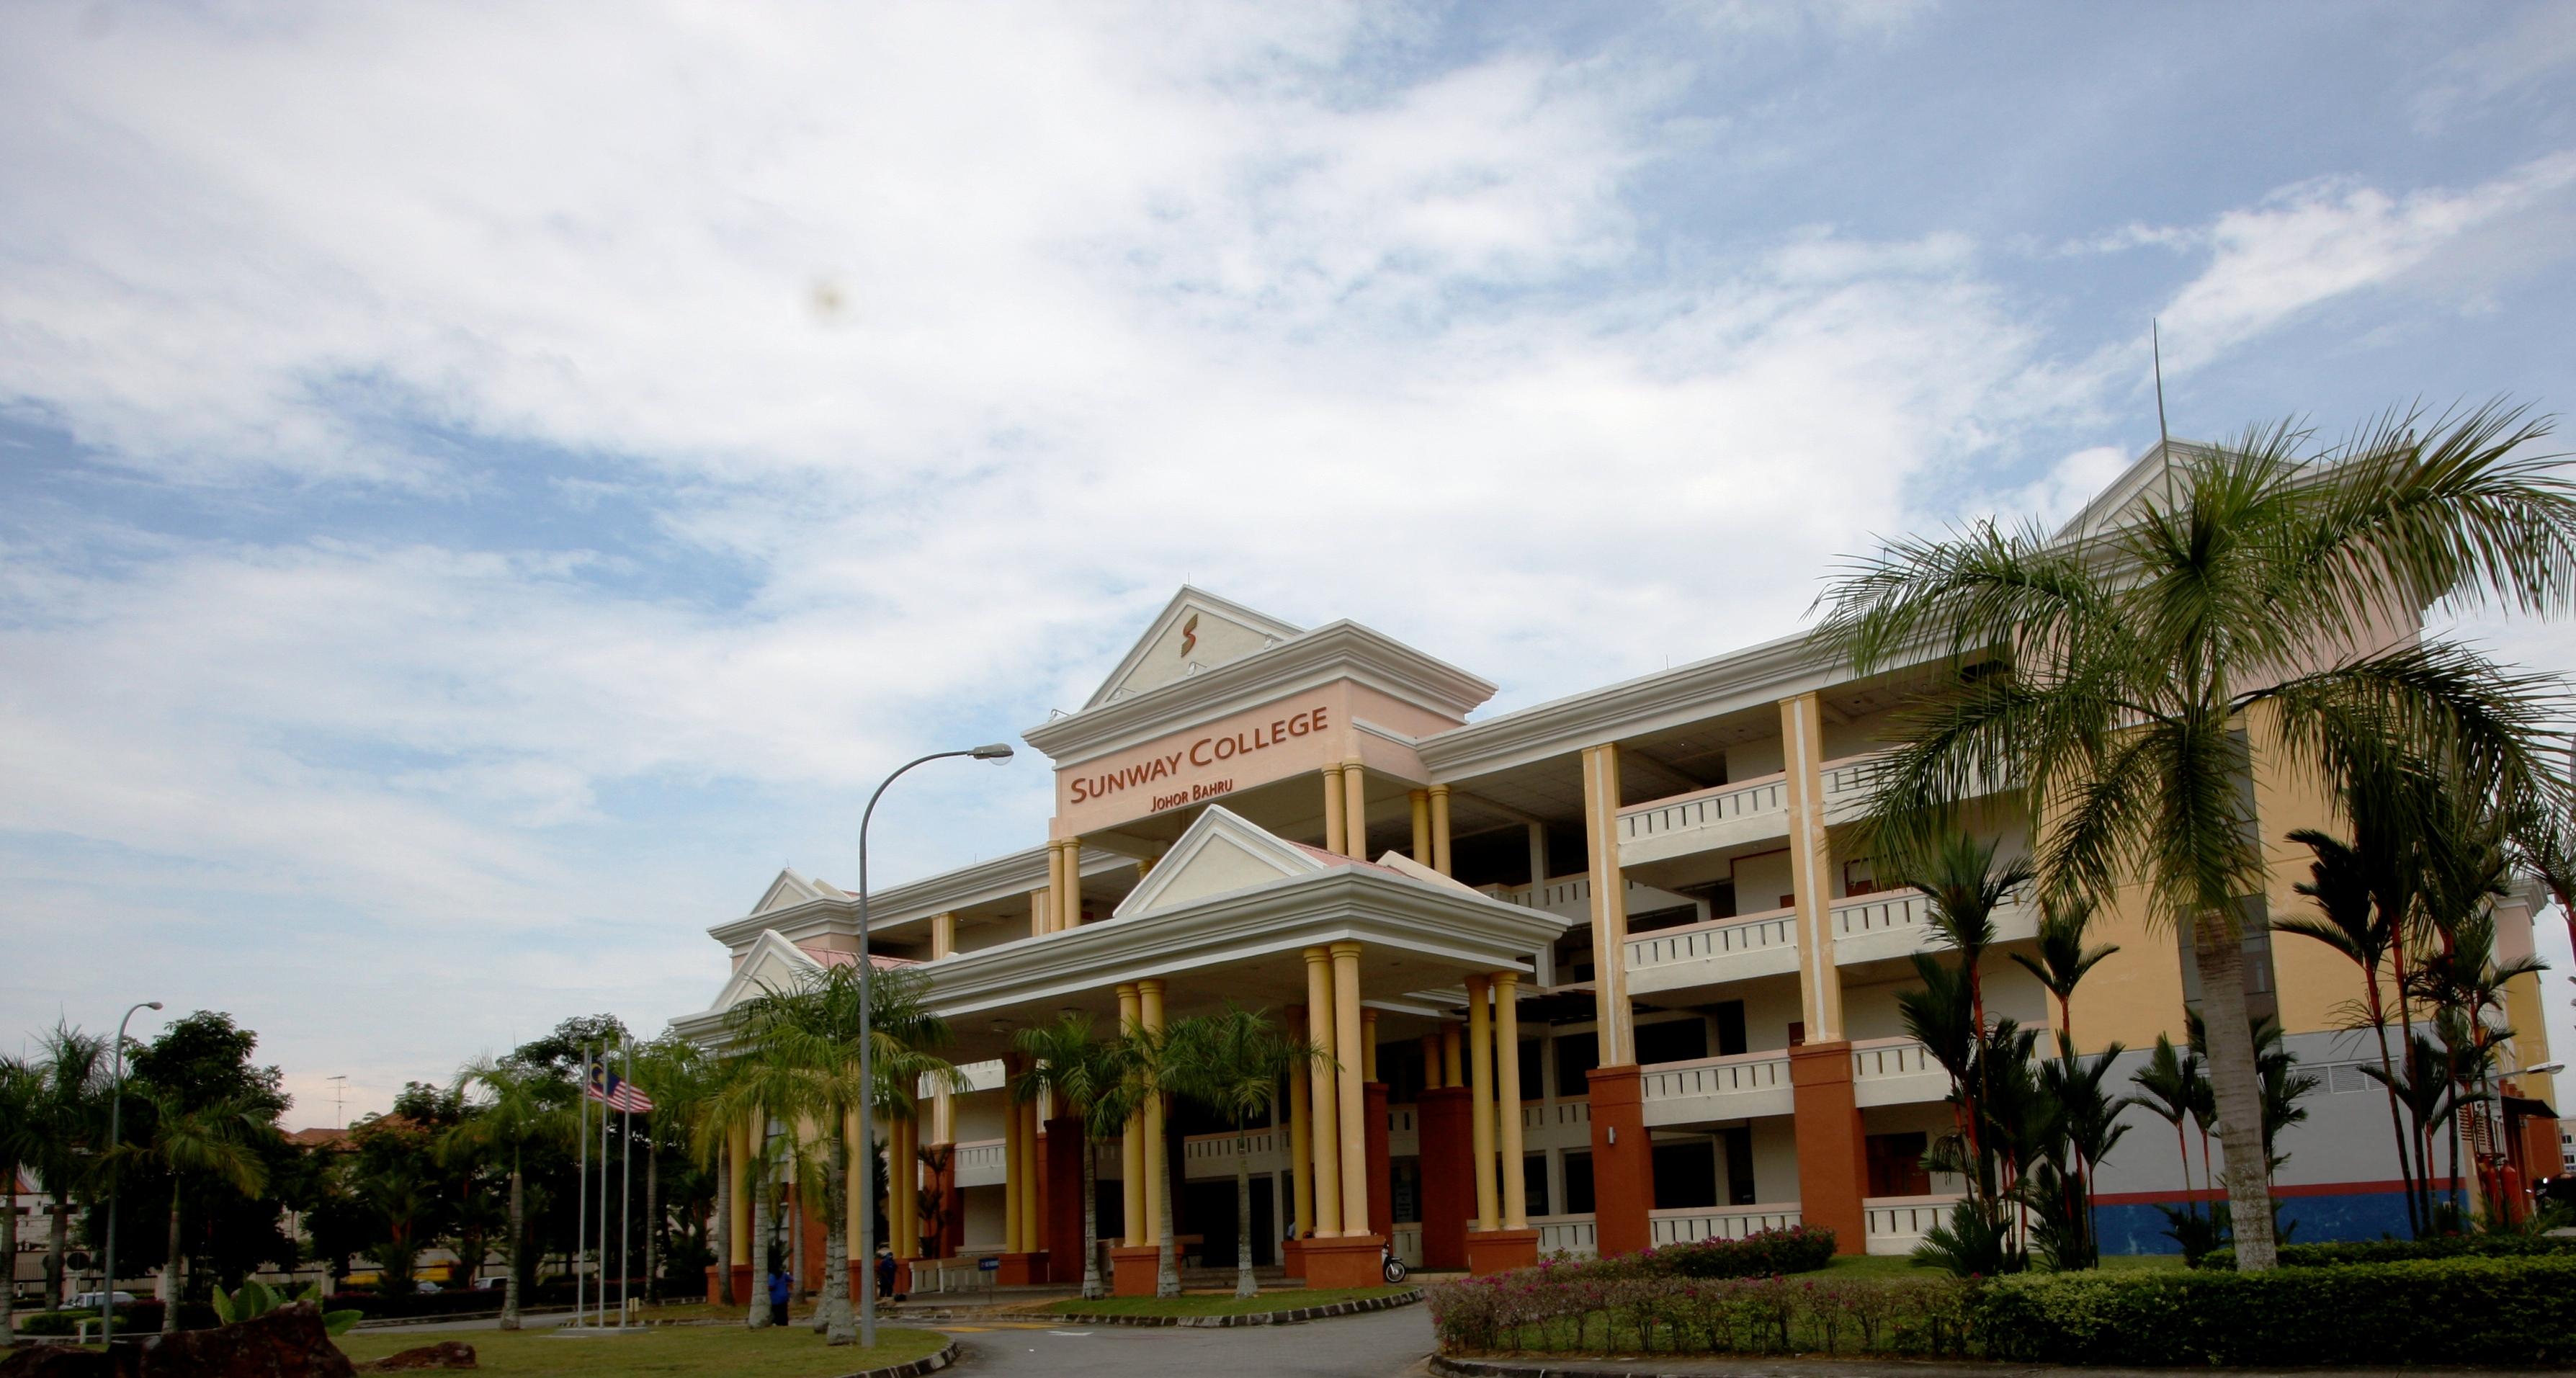 Sunway university college jb malaysia law bih jin expose bra - 1 3